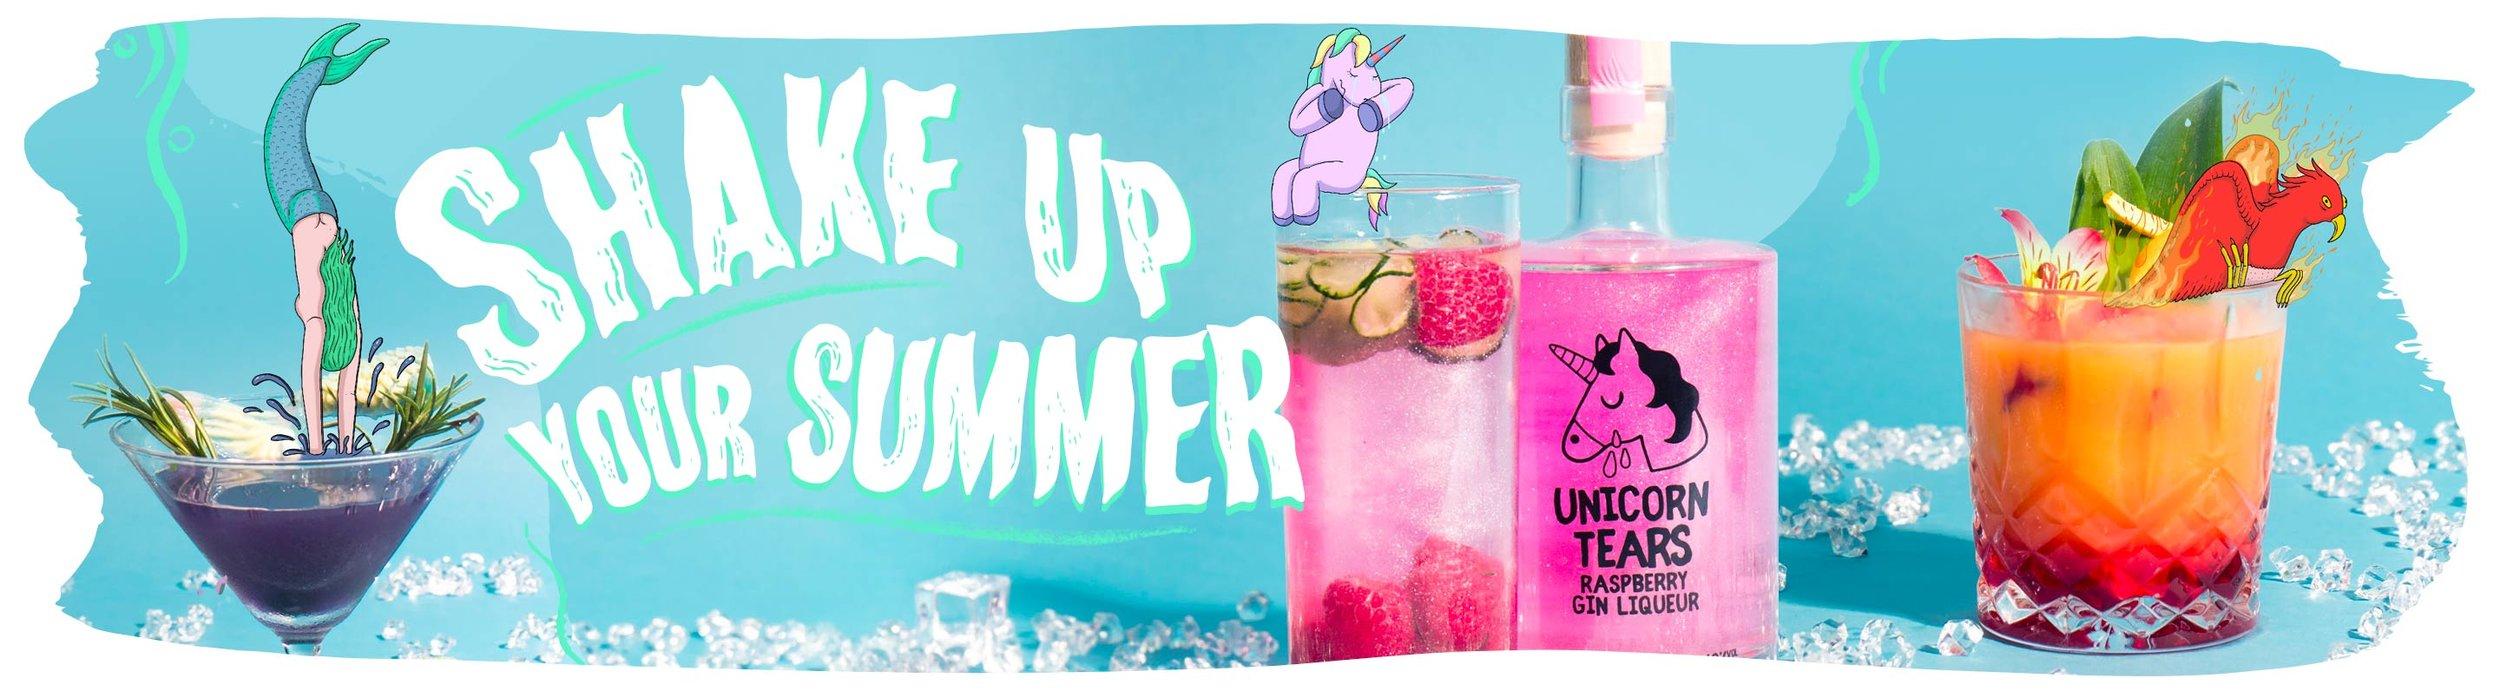 unicorntears_summer cocktails feature